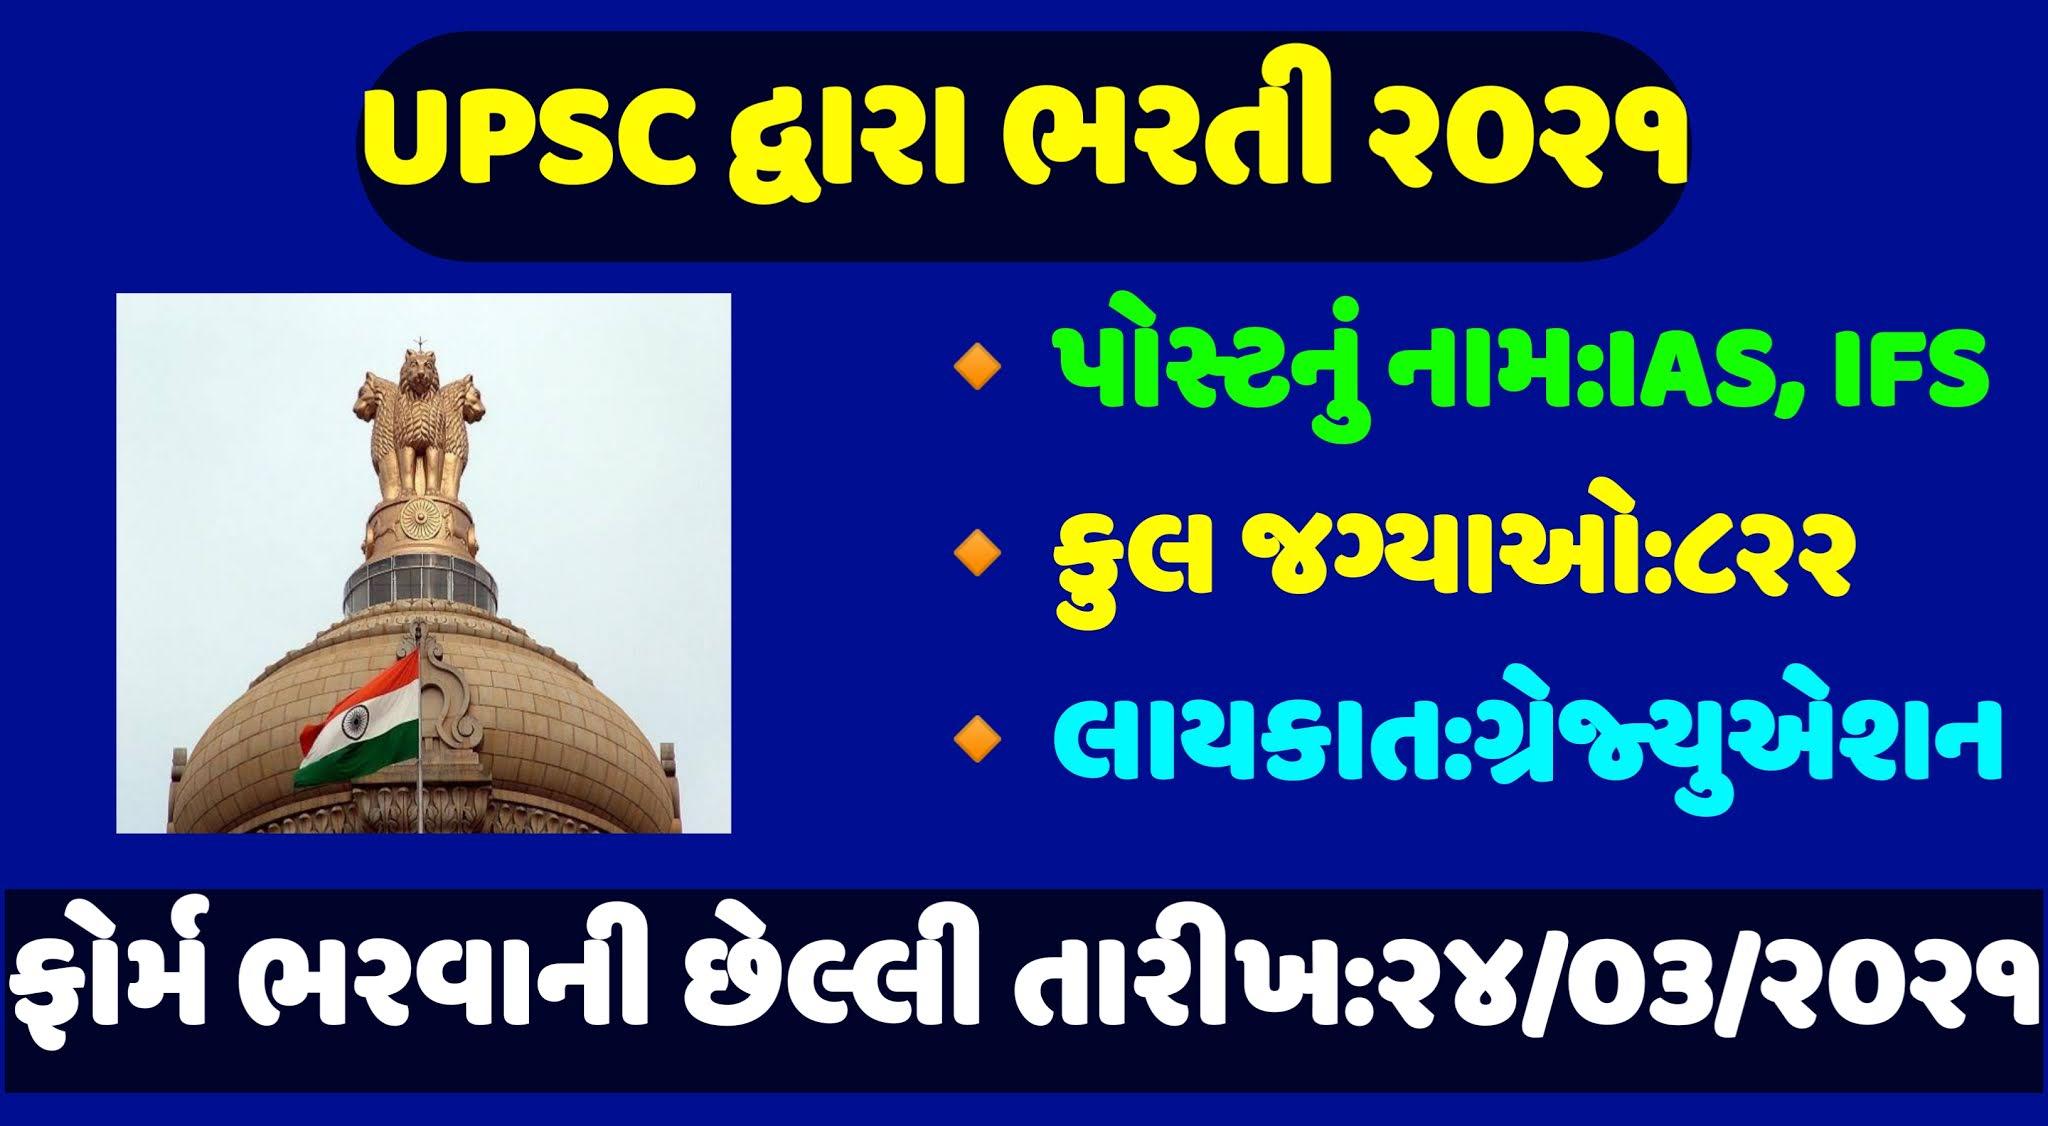 UPSC Civil Services exam 2021 notification,UPSC IAS Recruitment 2021 notification,UPSC Notification 2021,UPSC IAS notification 2021,UPSC calendar 2021